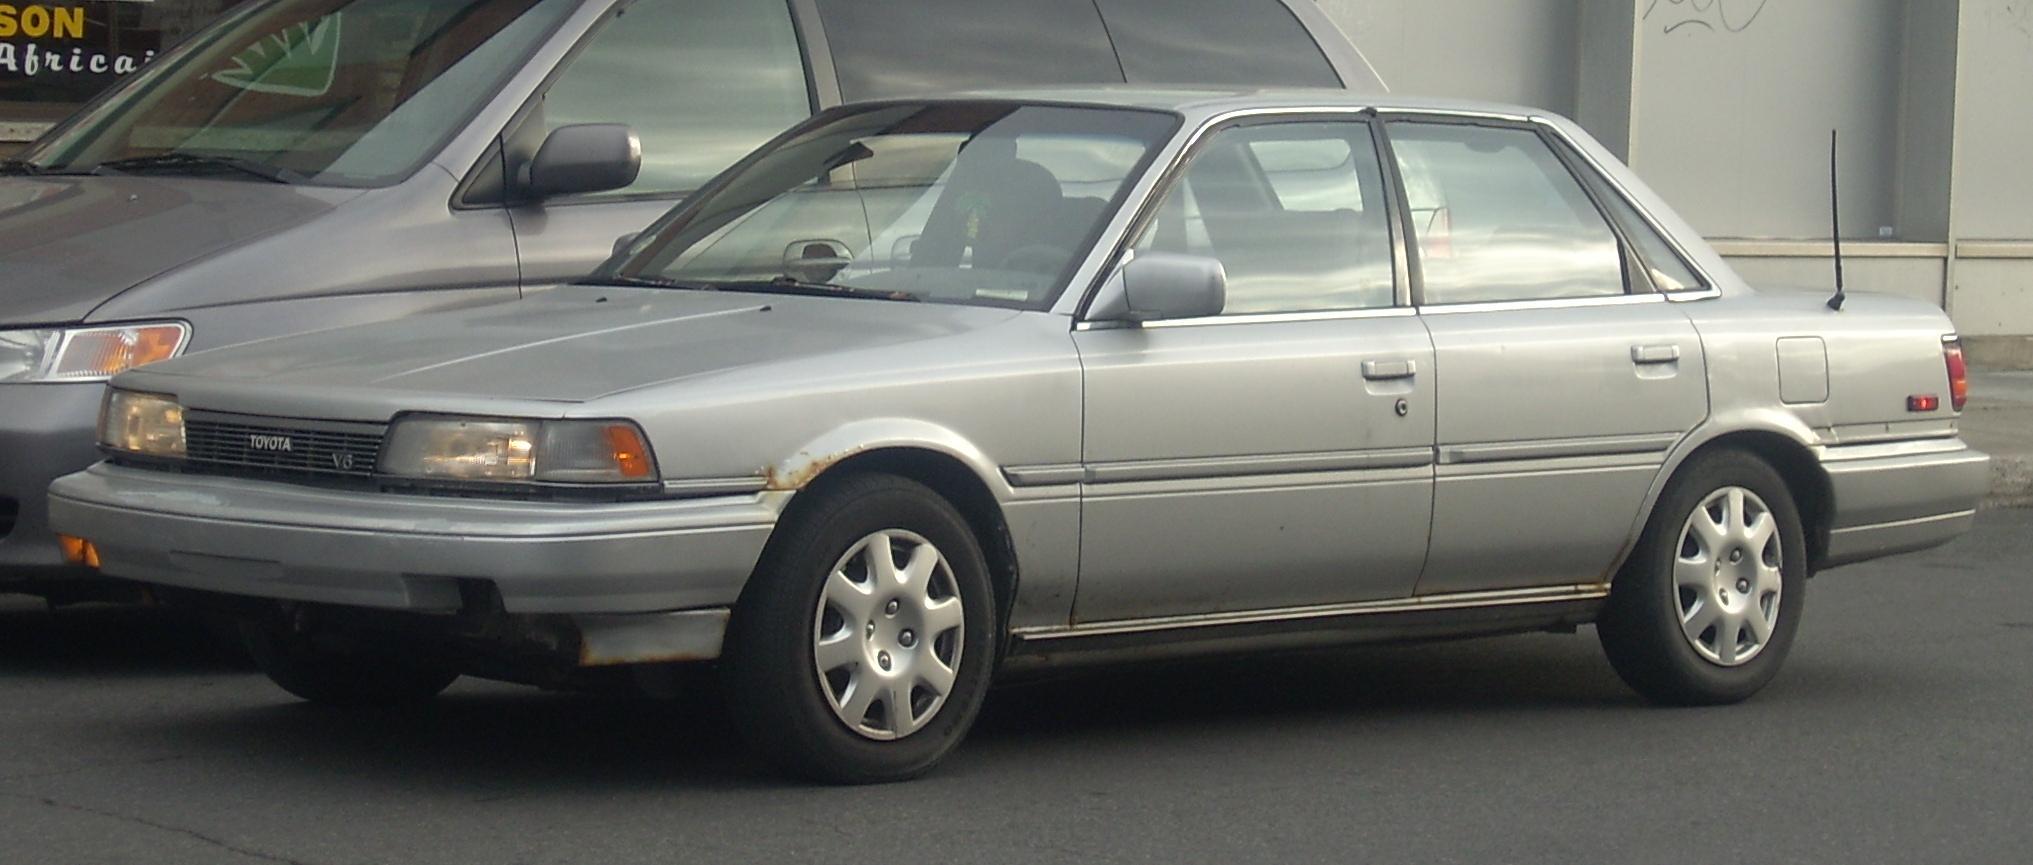 File 87 90 Toyota Camry V6 Sedan Jpg Wikimedia Commons